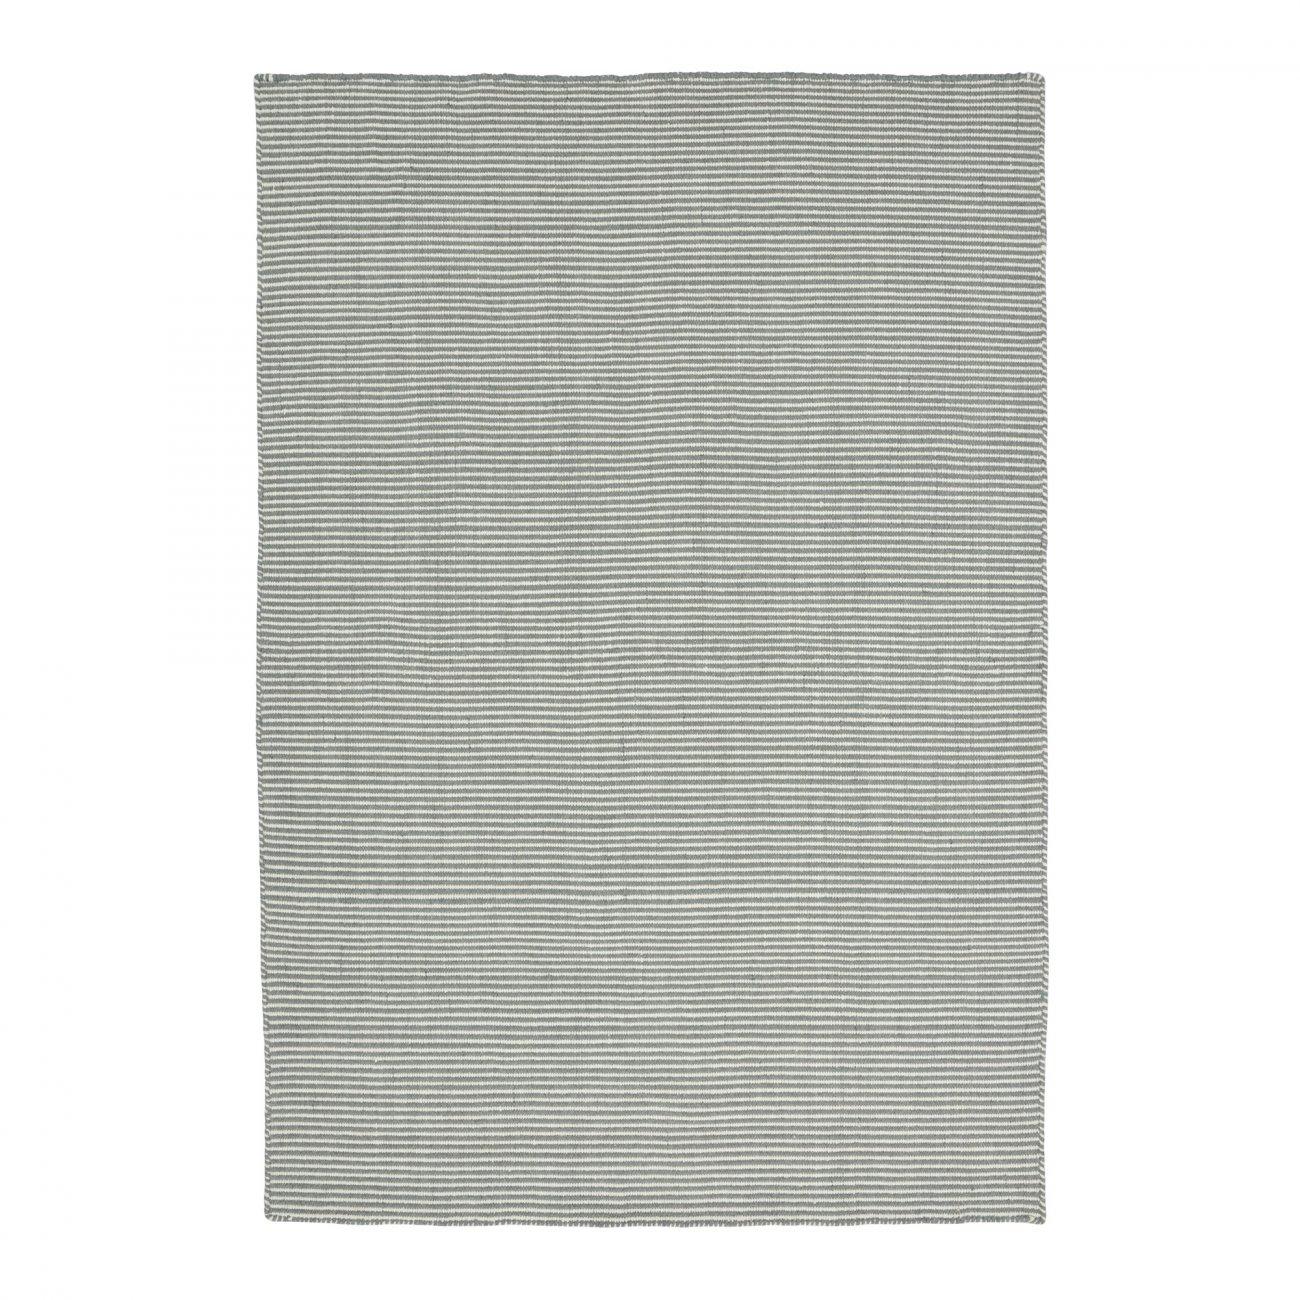 Ullmatta AJO 200 x 300 cm randig, Linie Design